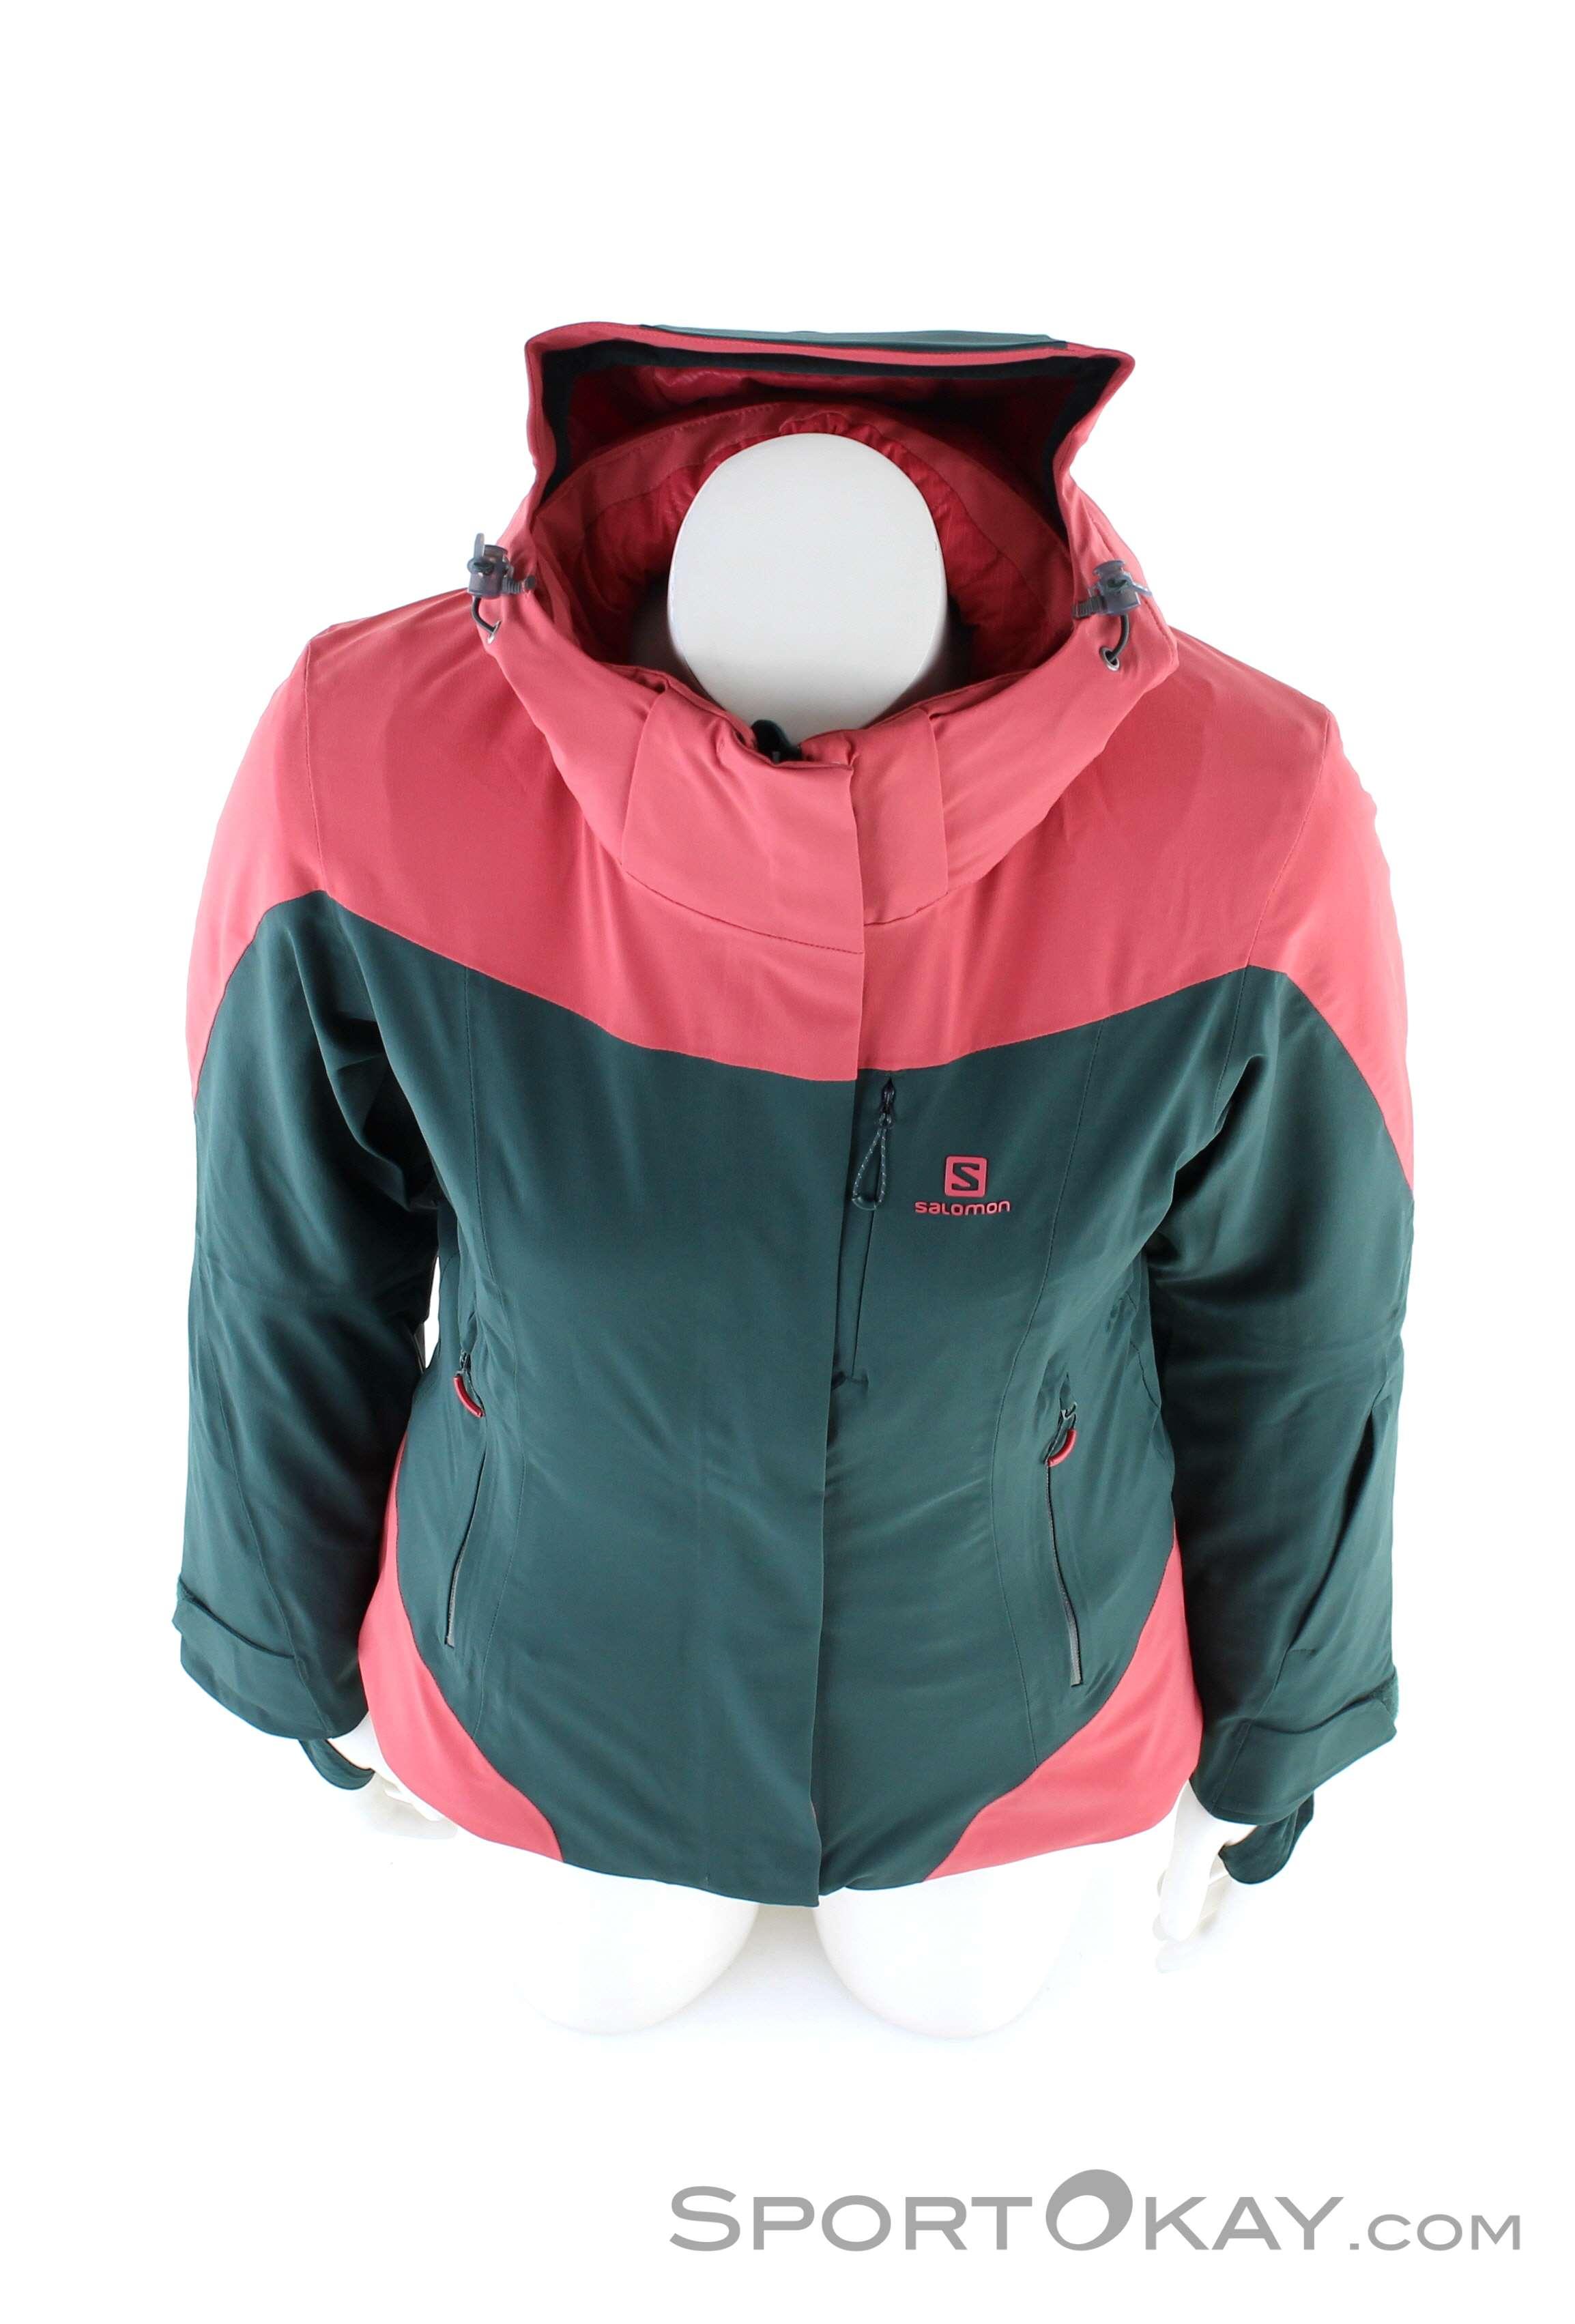 Salomon Salomon Icerocket Jacket Womens Ski Jacket